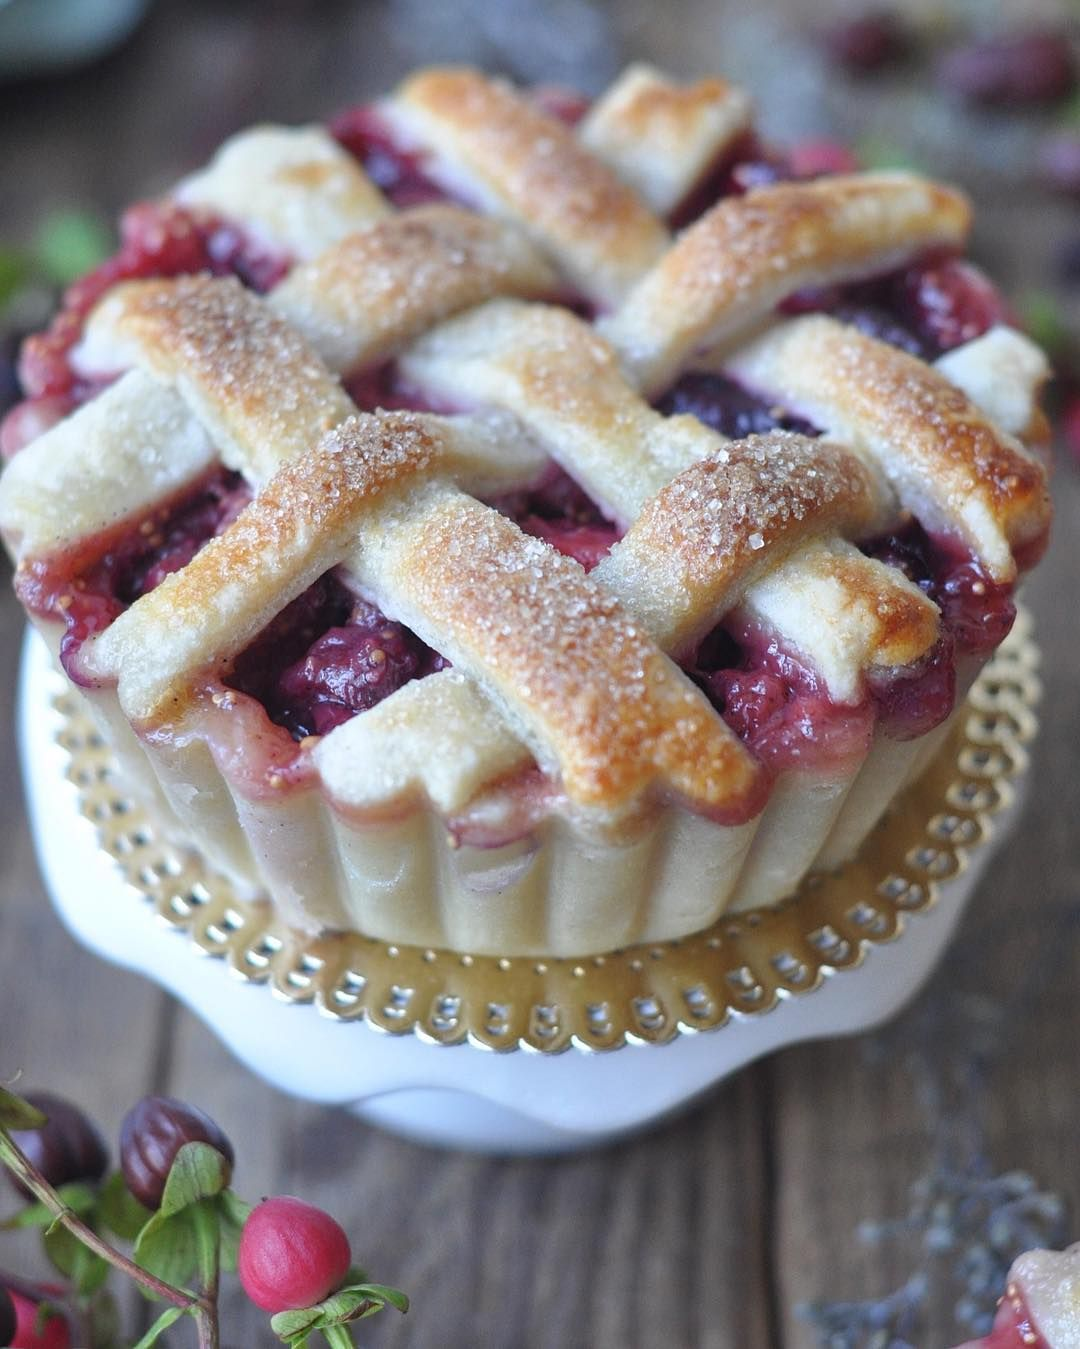 Up close and personal with this strawberry-fig pie. . . . .  #strawberryfigpies #strawberrydesserts #figs #pies #pie #piecrust #latticepie #lattice #latticework #desserts